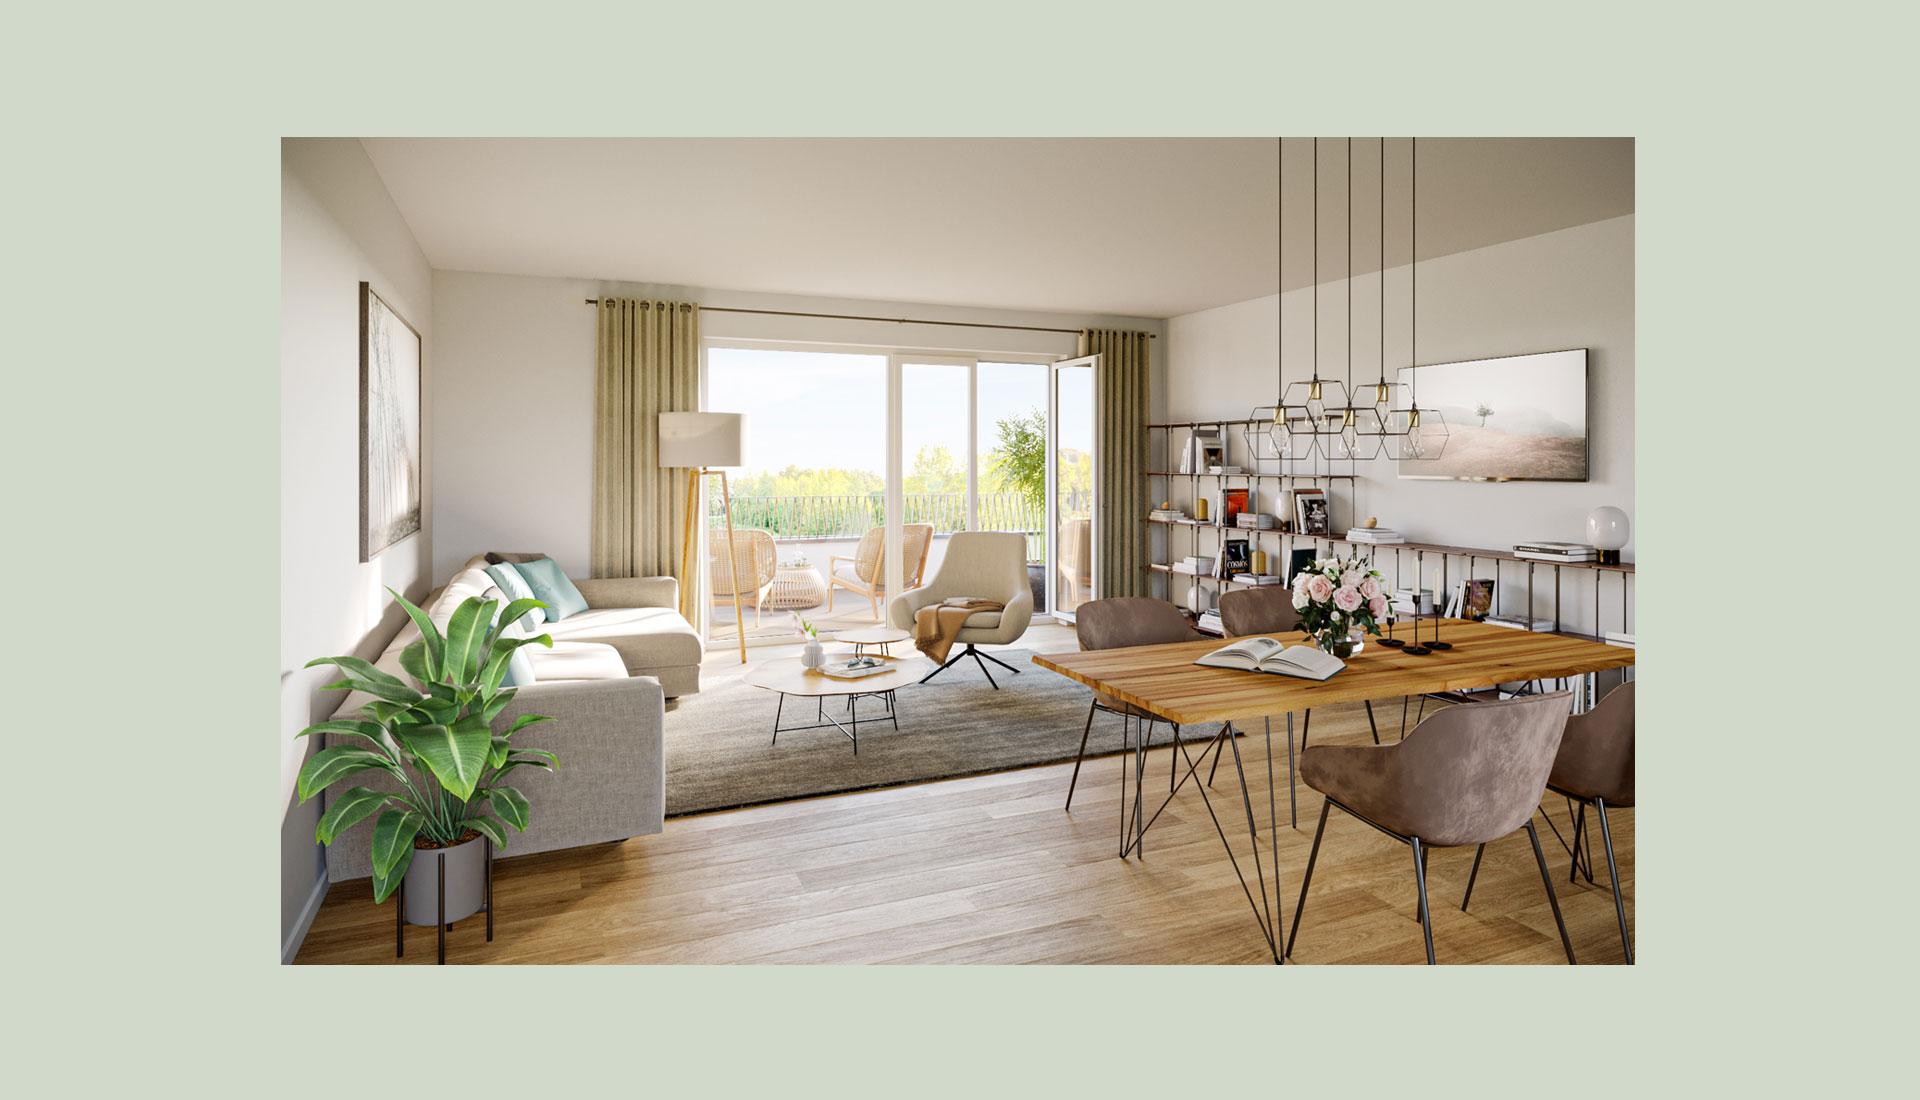 OPUS Marketing / Benker 4 / Immobilienvisualisierung